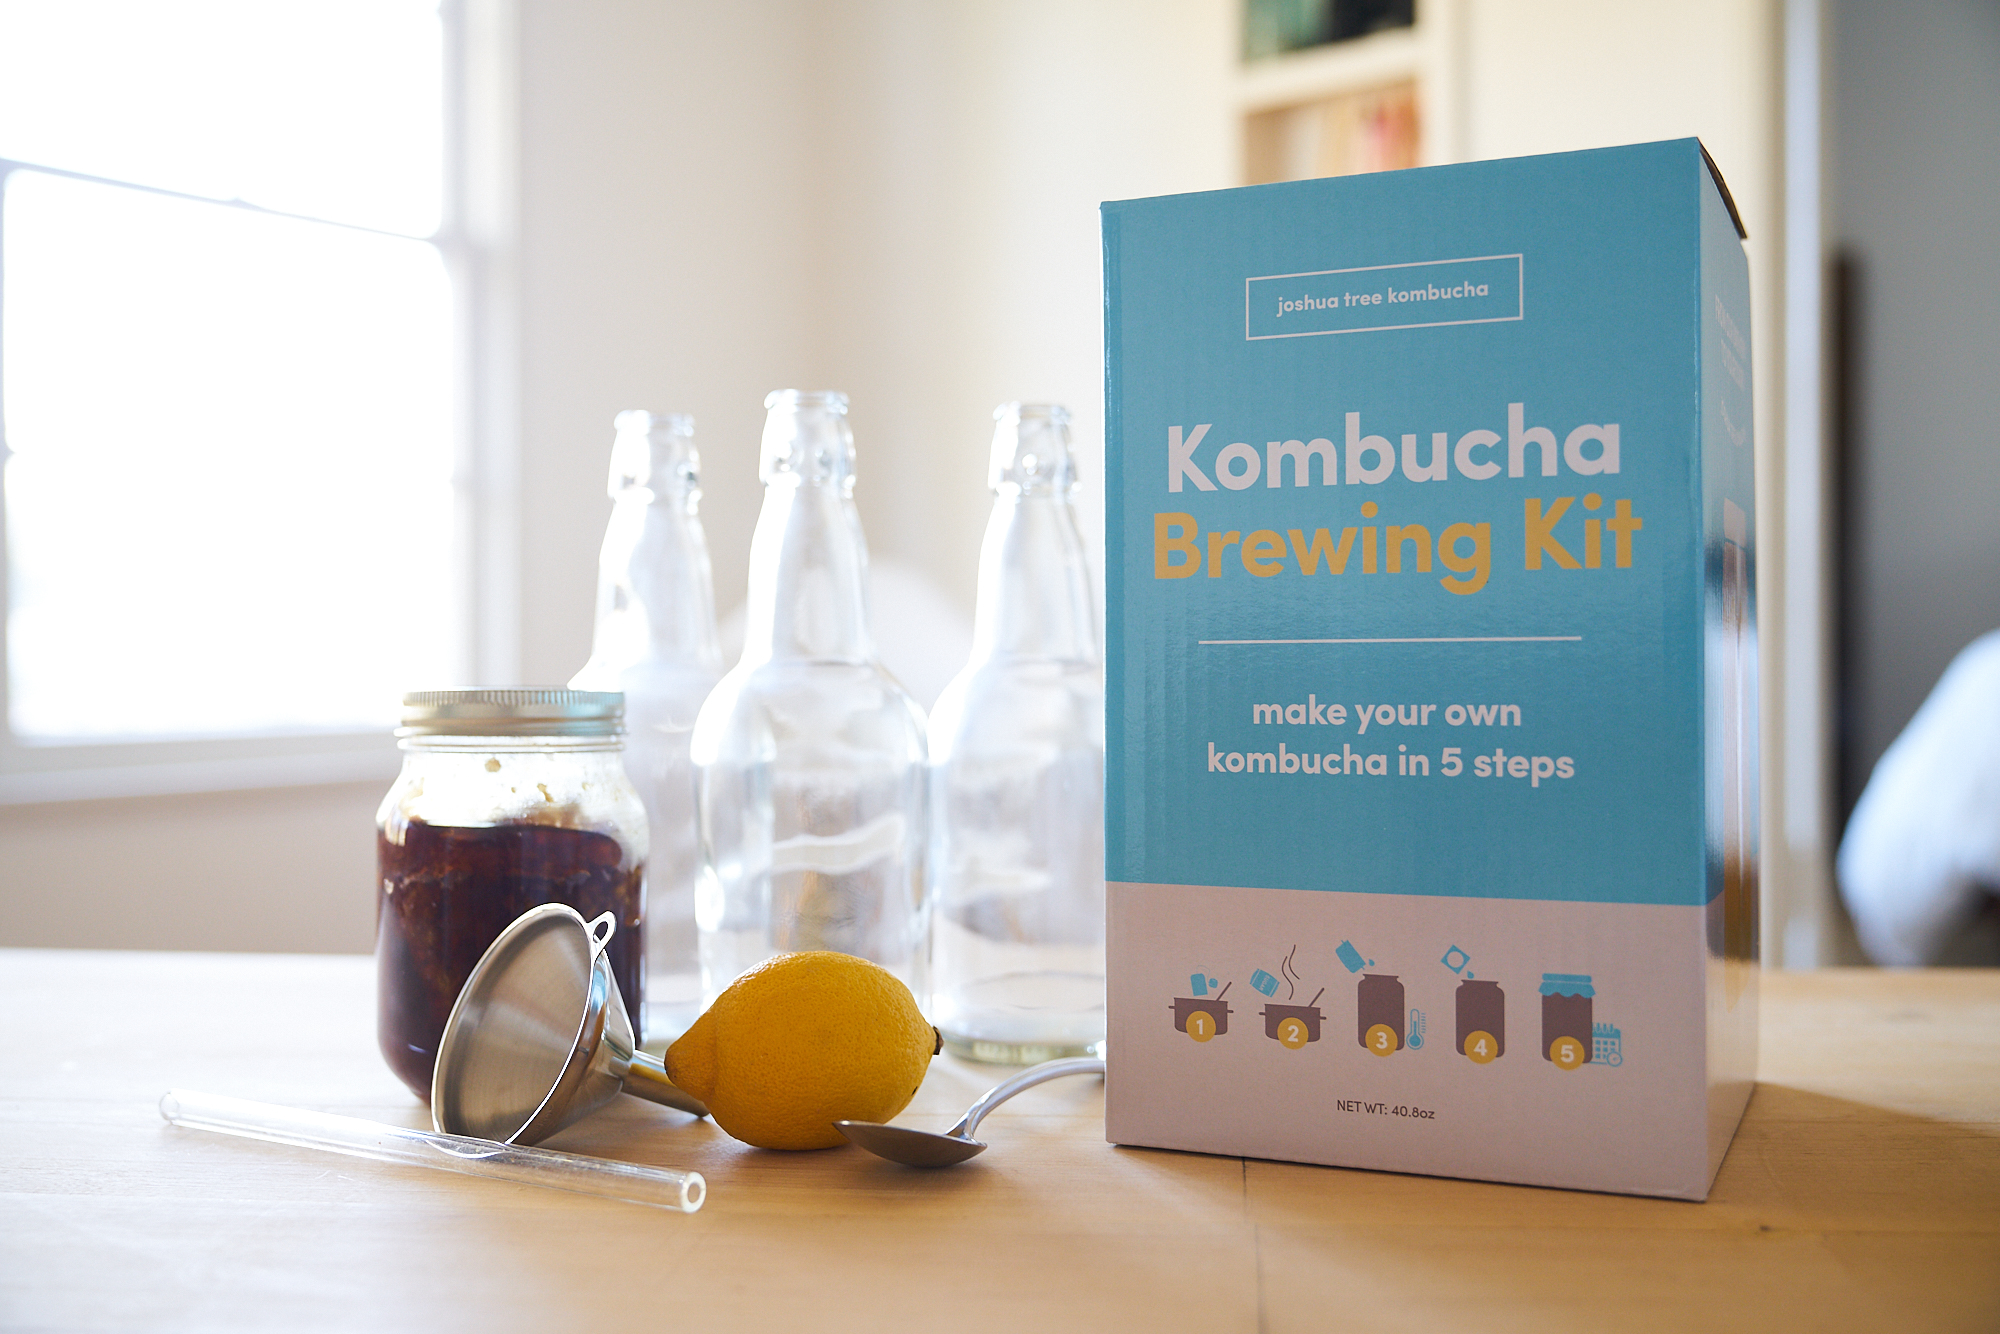 BREW - Everything DIY Kombucha, FAQ, Recipes and more..